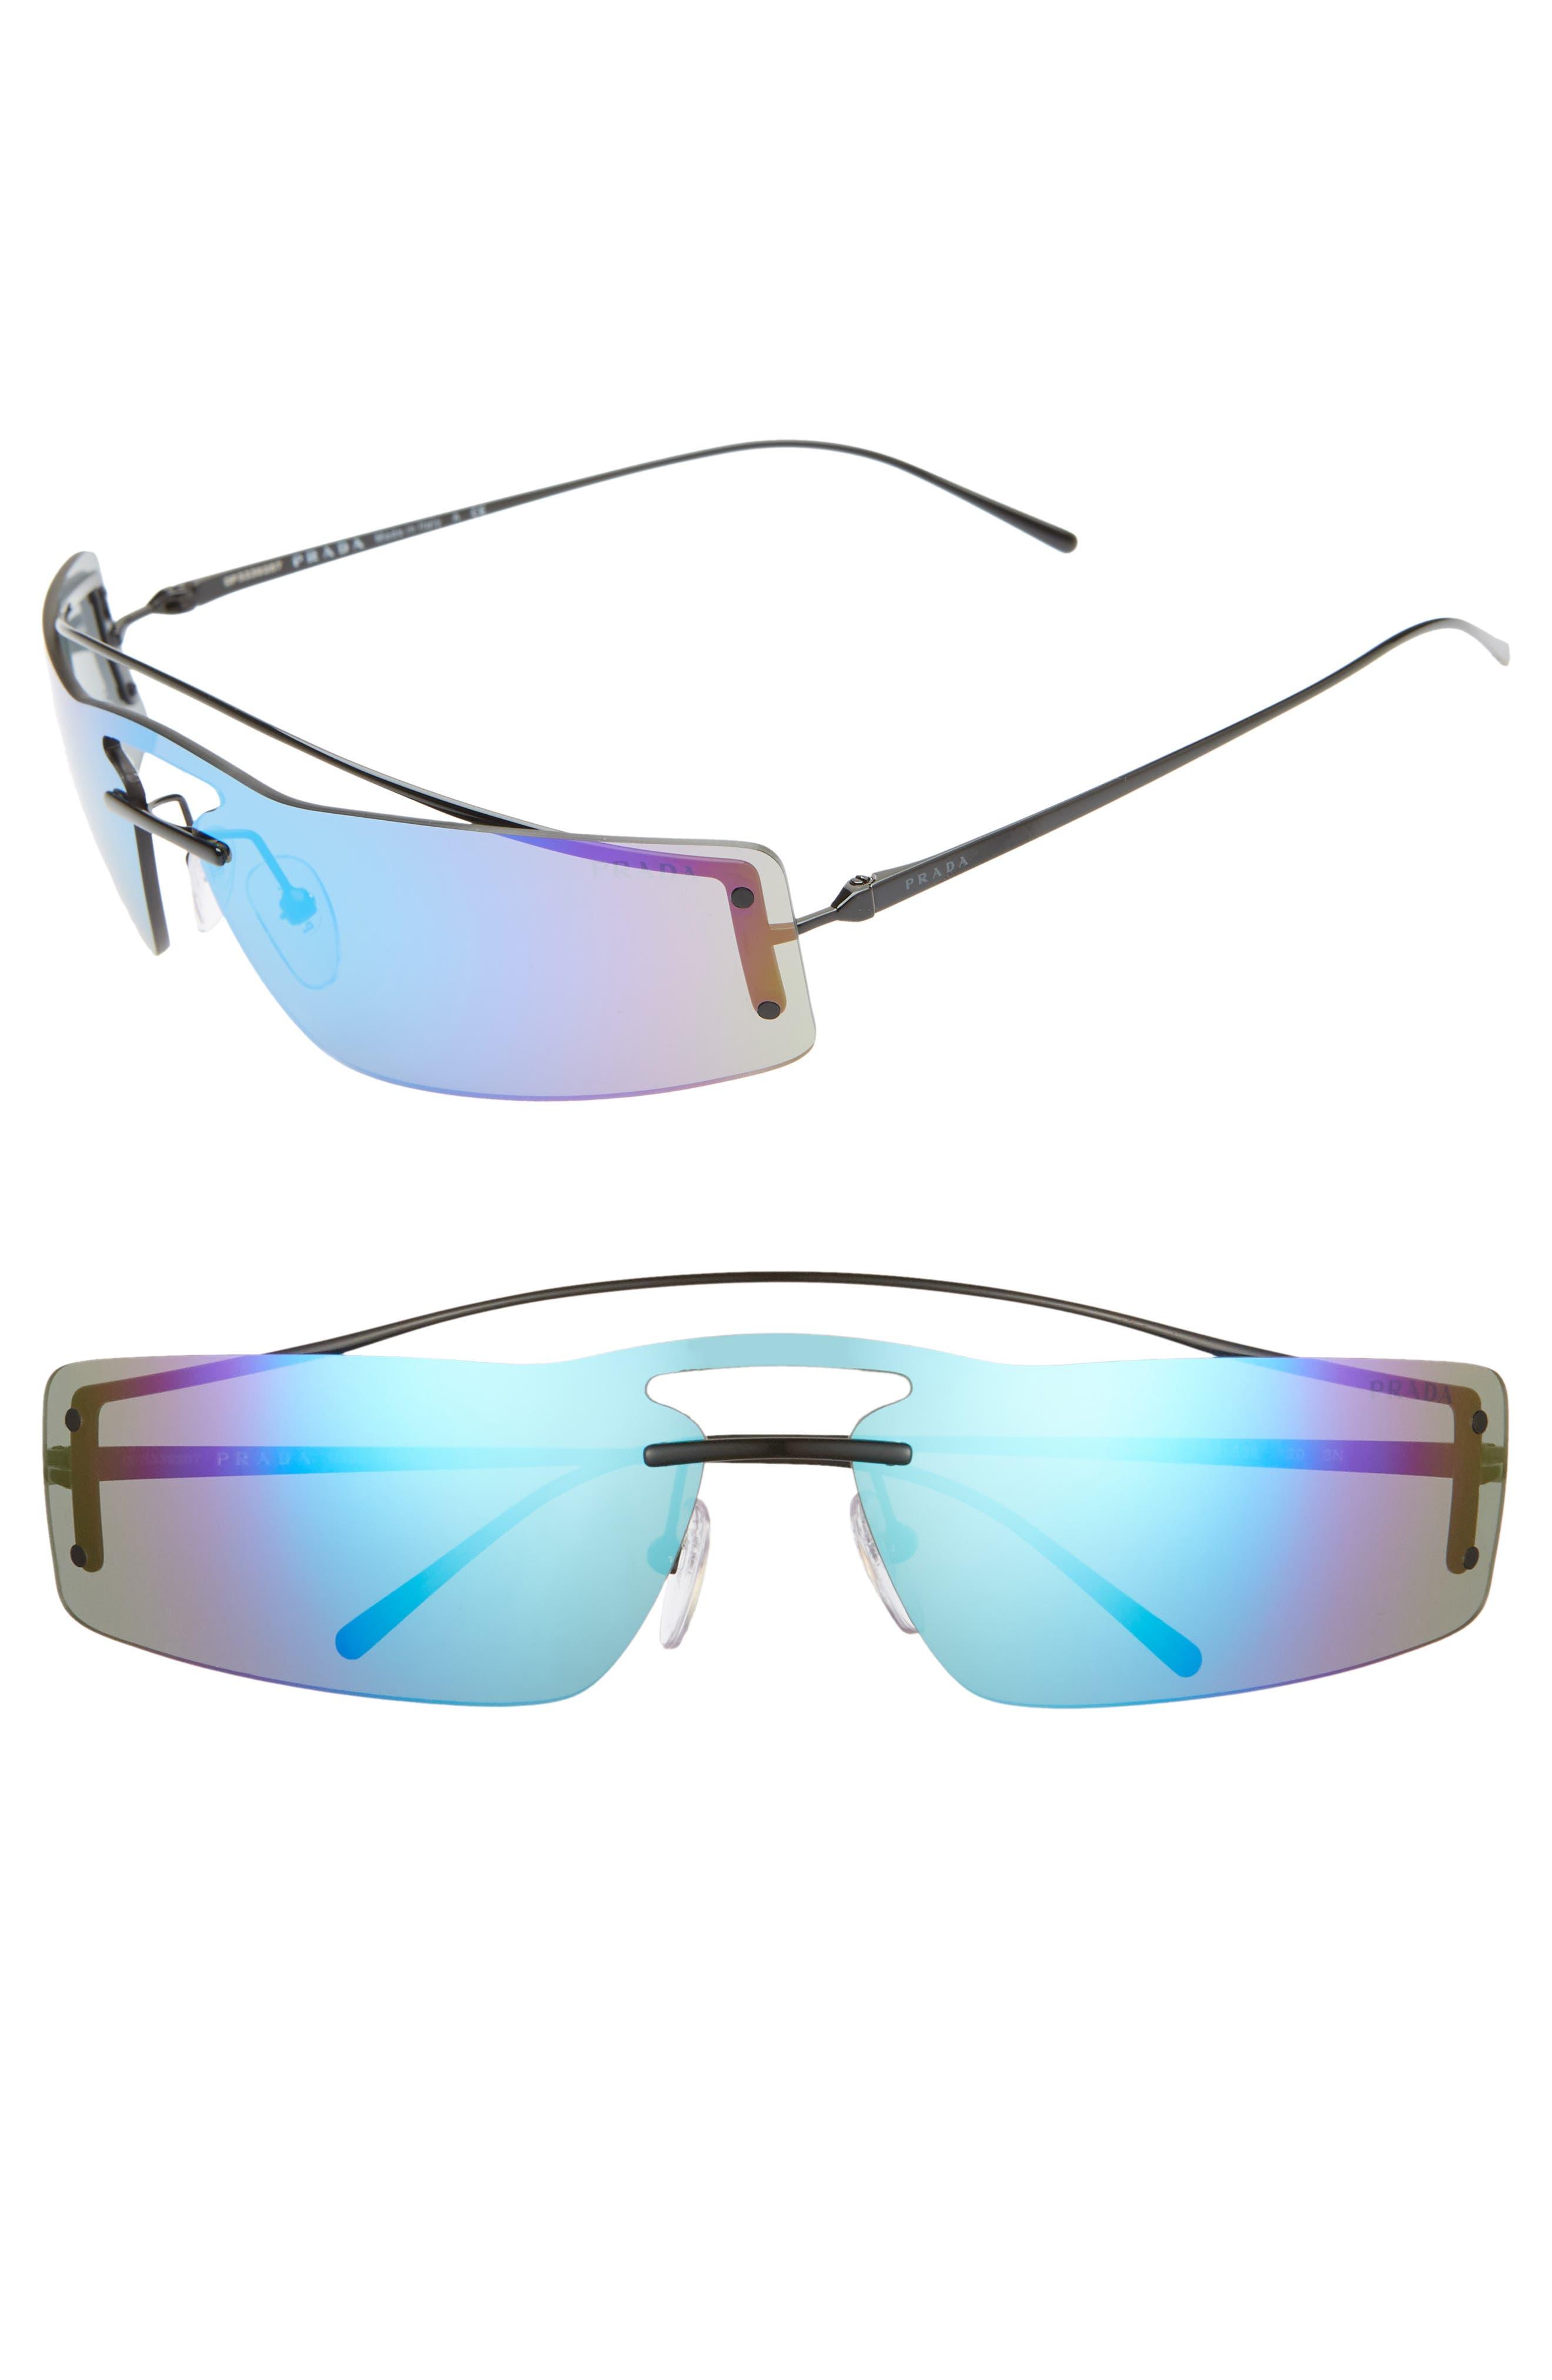 3a31129c318f1 ... best price prada 73mm mirrored wrap sunglasses 03b16 0bc77